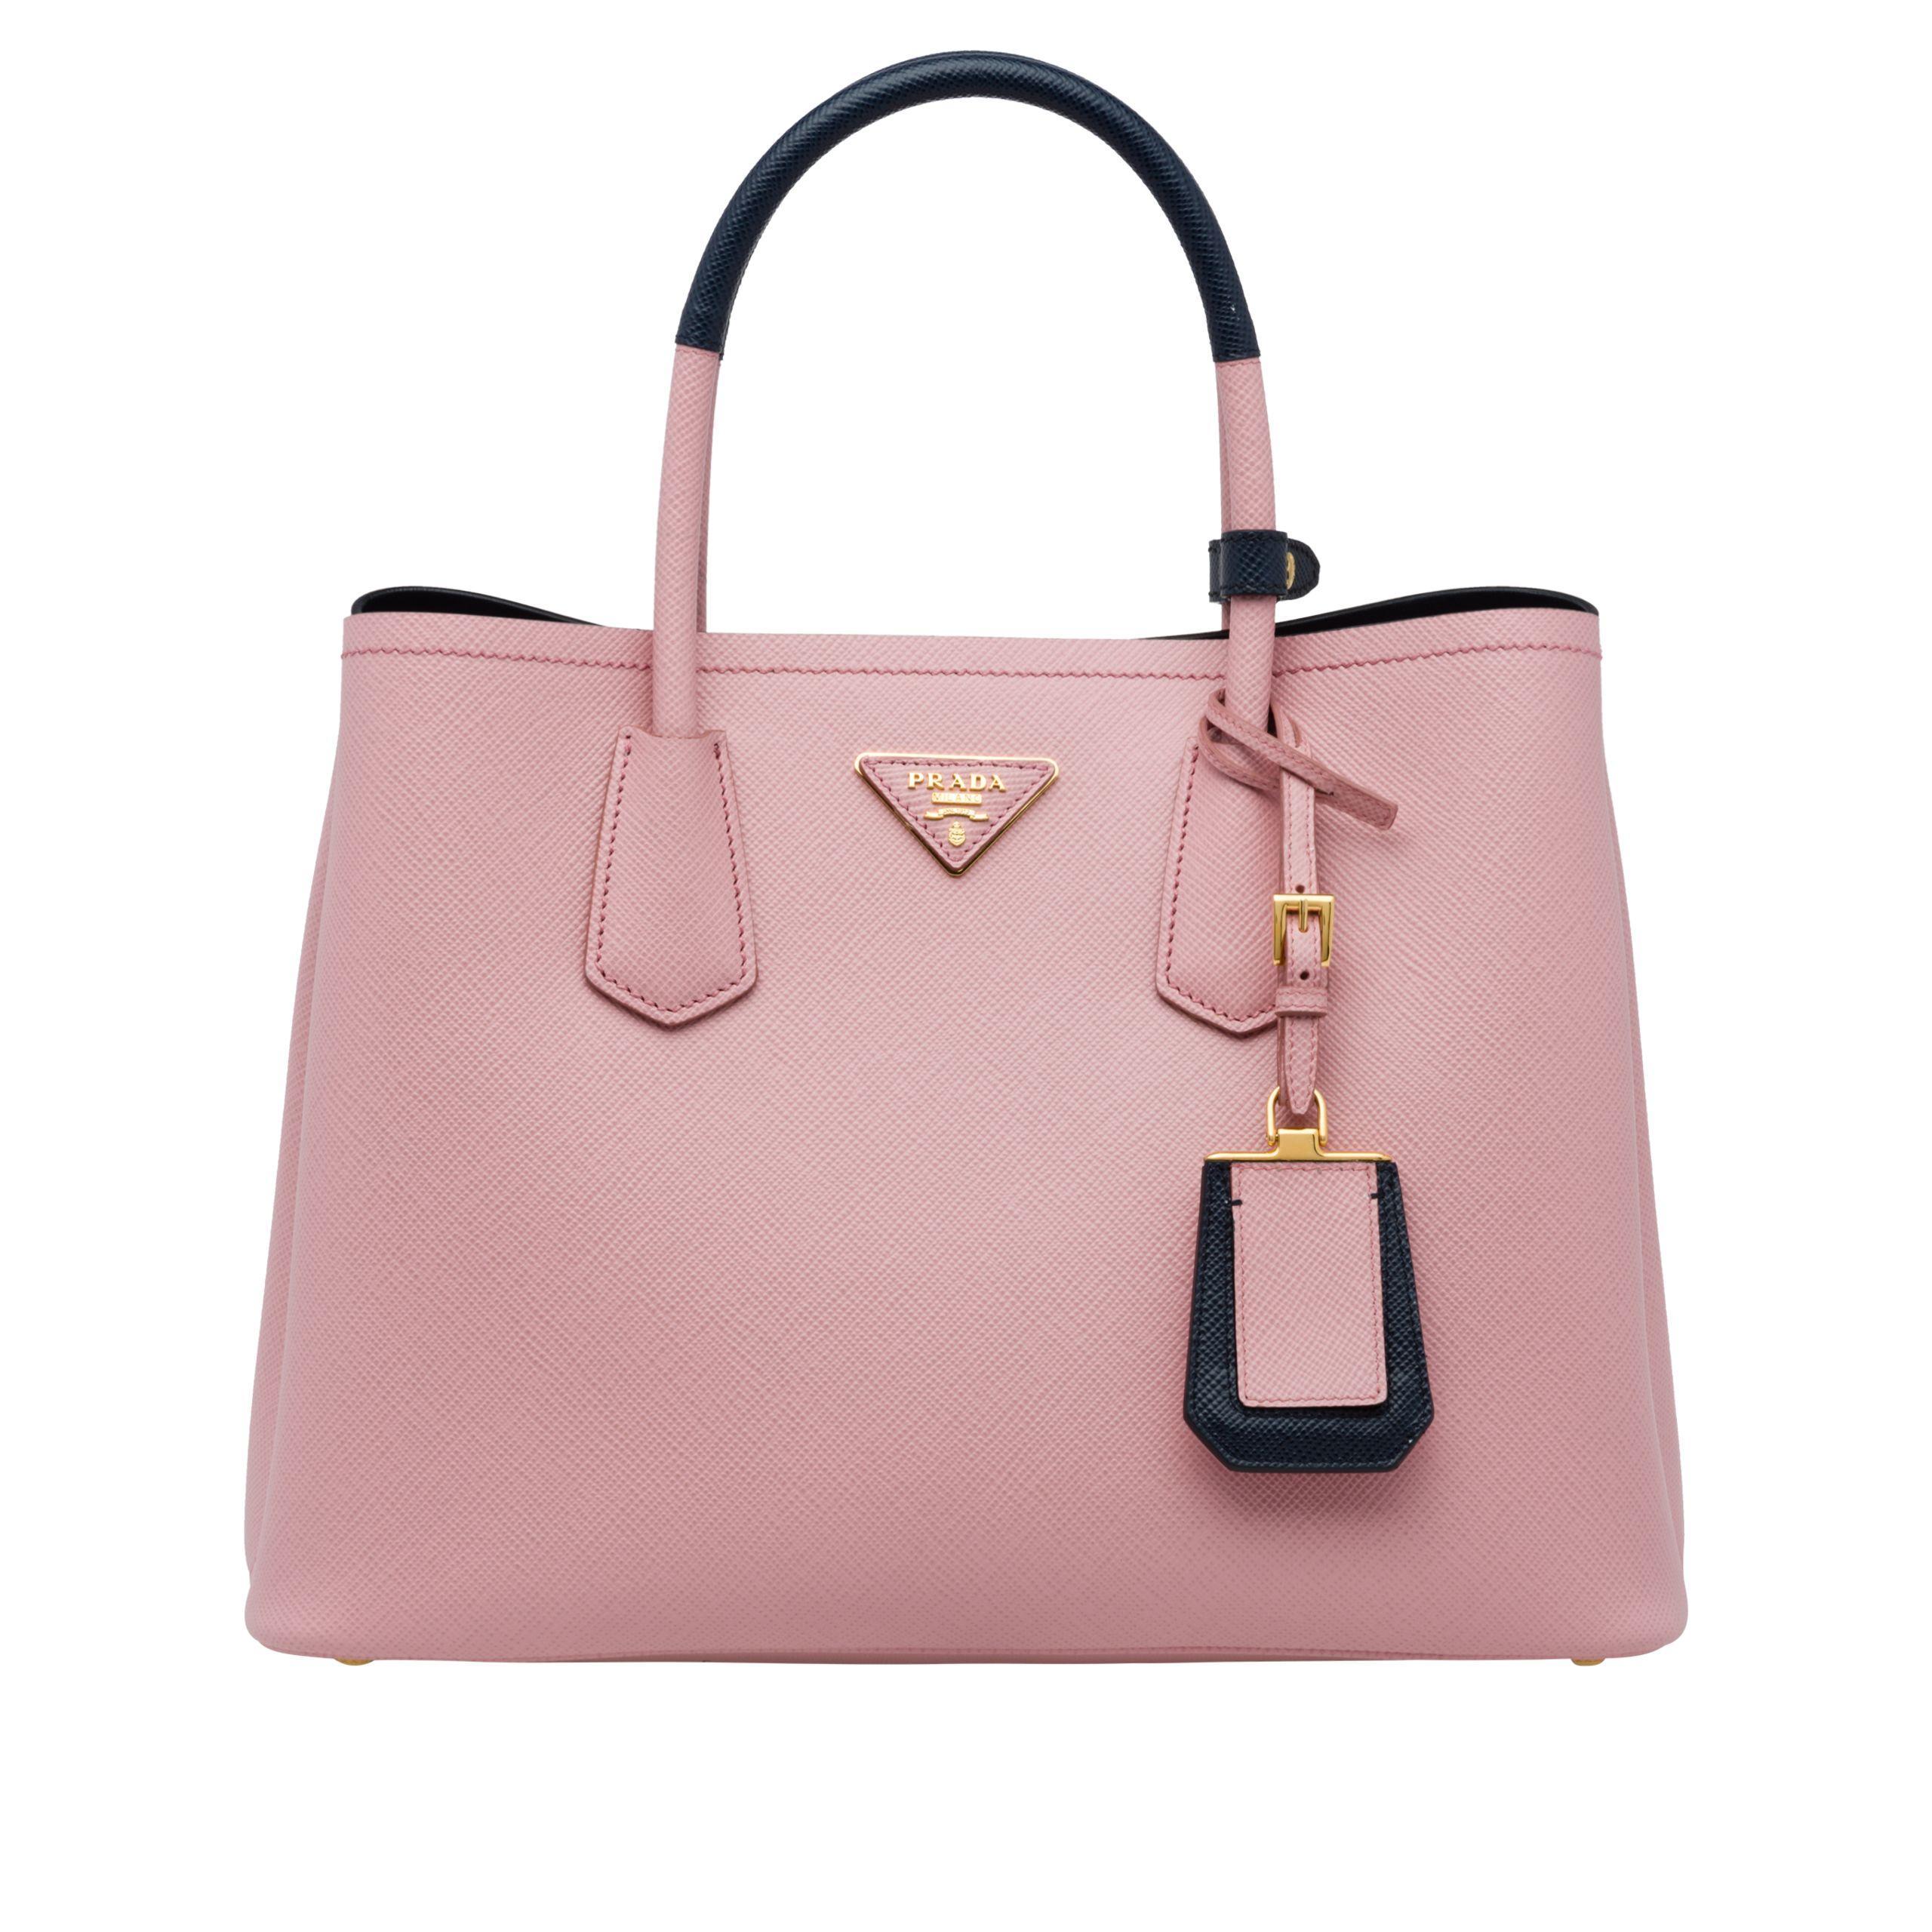 a2f6a404f7c7 Prada. Women s Double Medium Bag.  2